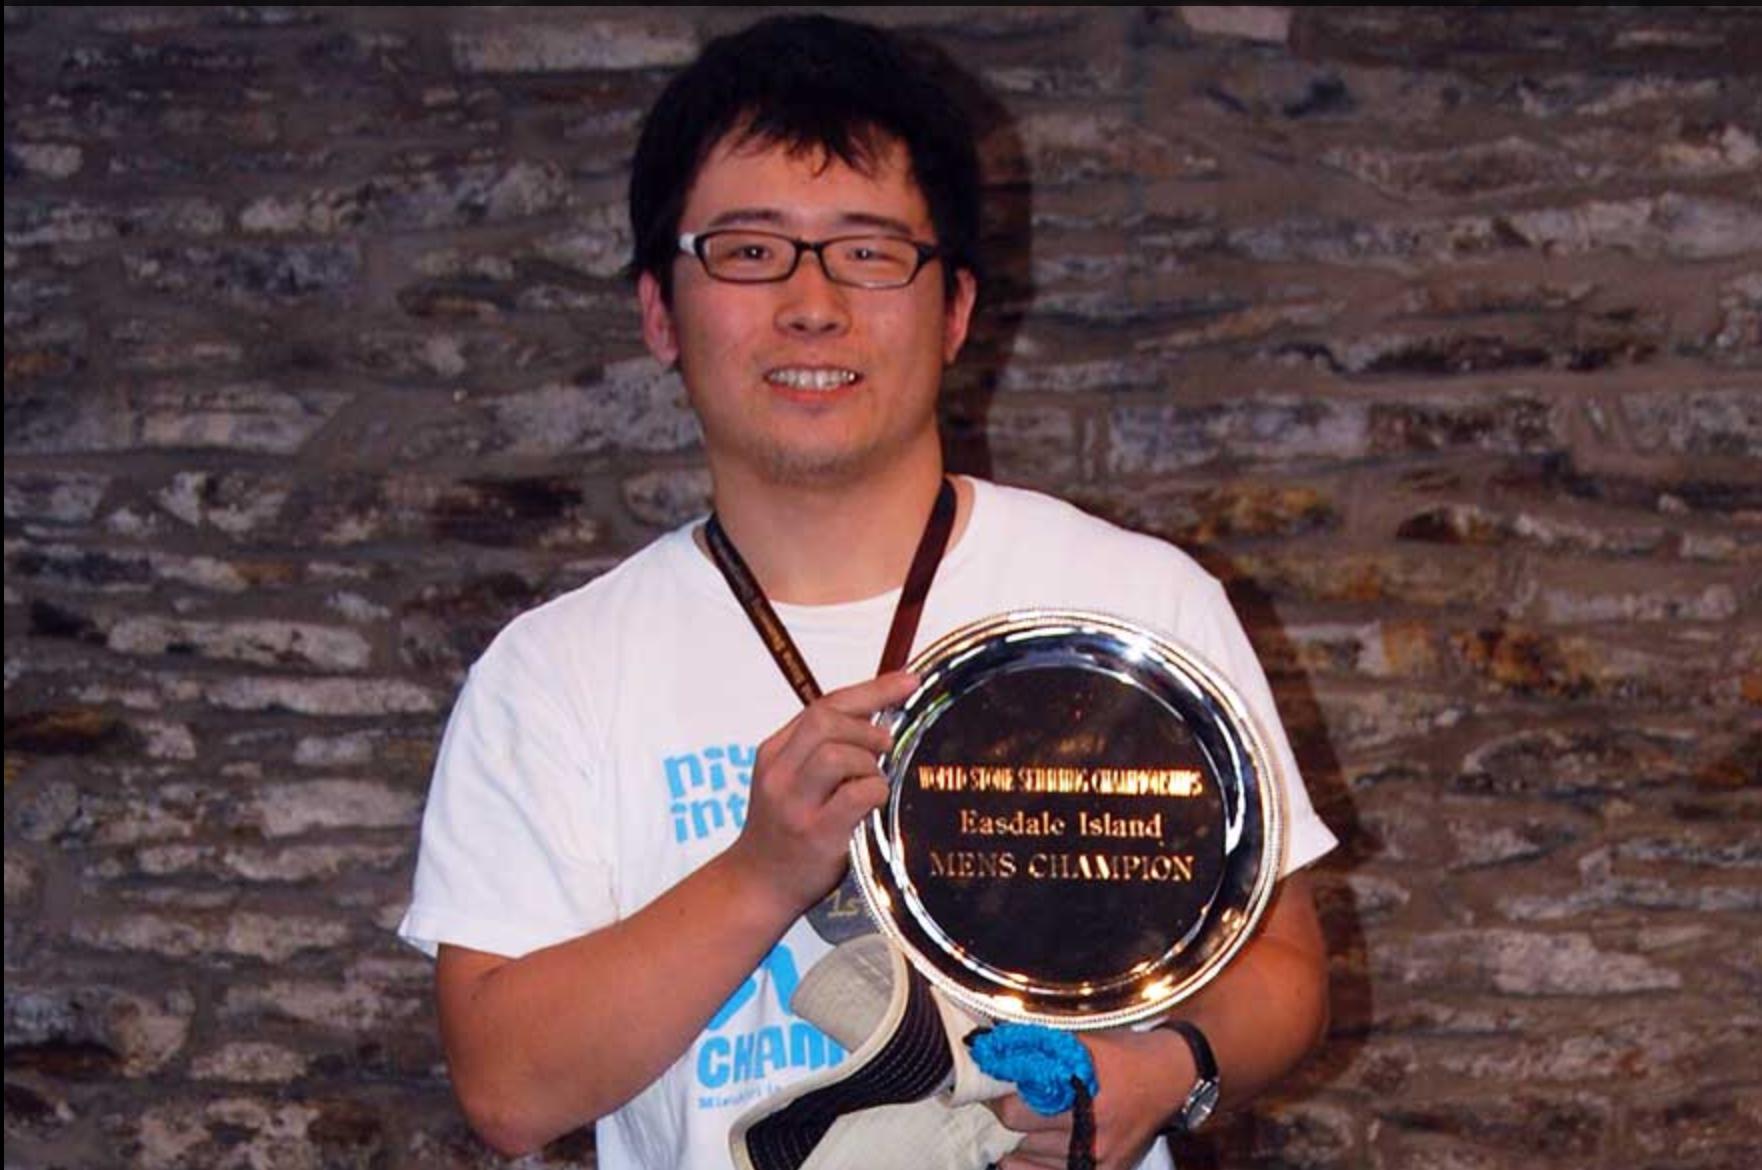 Keisuke Hashimoto - 2017 World Stone Skimming Champion